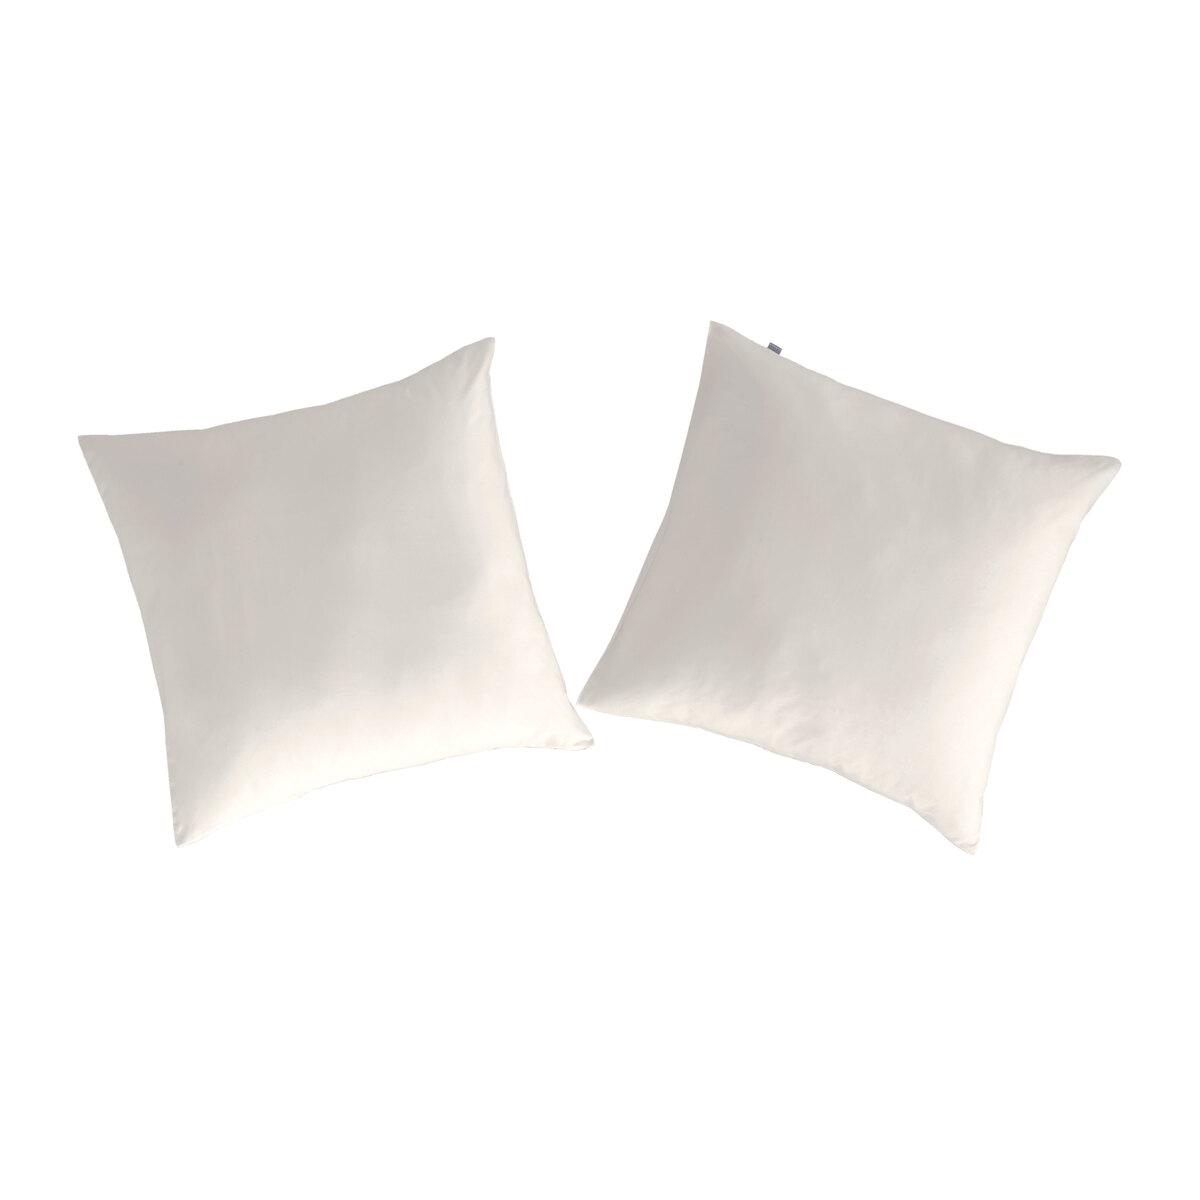 2 taies d'oreiller en coton beige 65x65